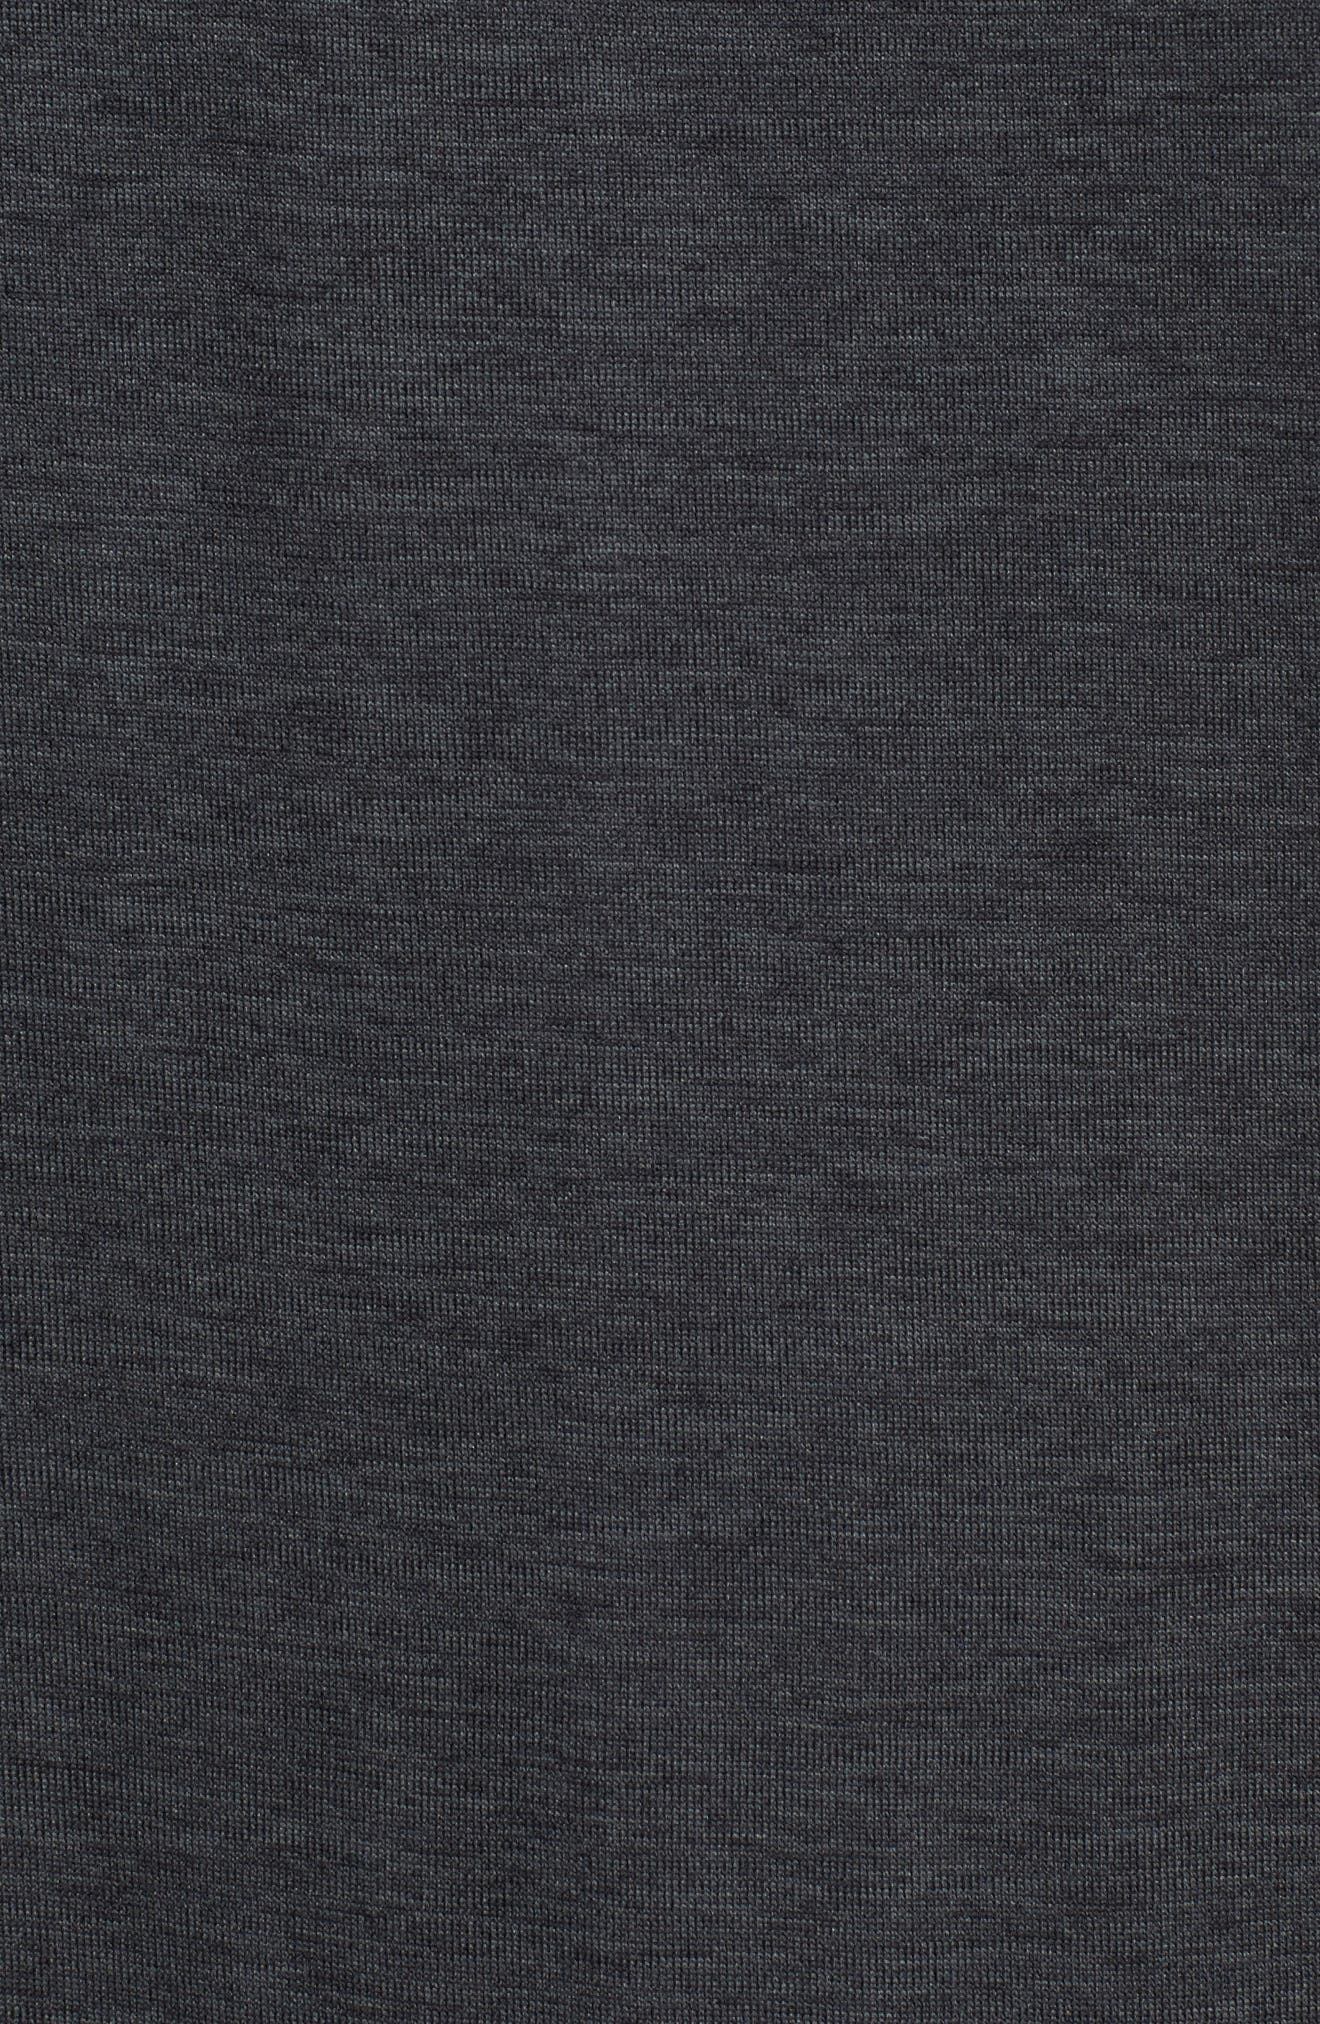 Long Sleeve Training T-Shirt,                             Alternate thumbnail 5, color,                             Black/ Anthracite/ Hematite